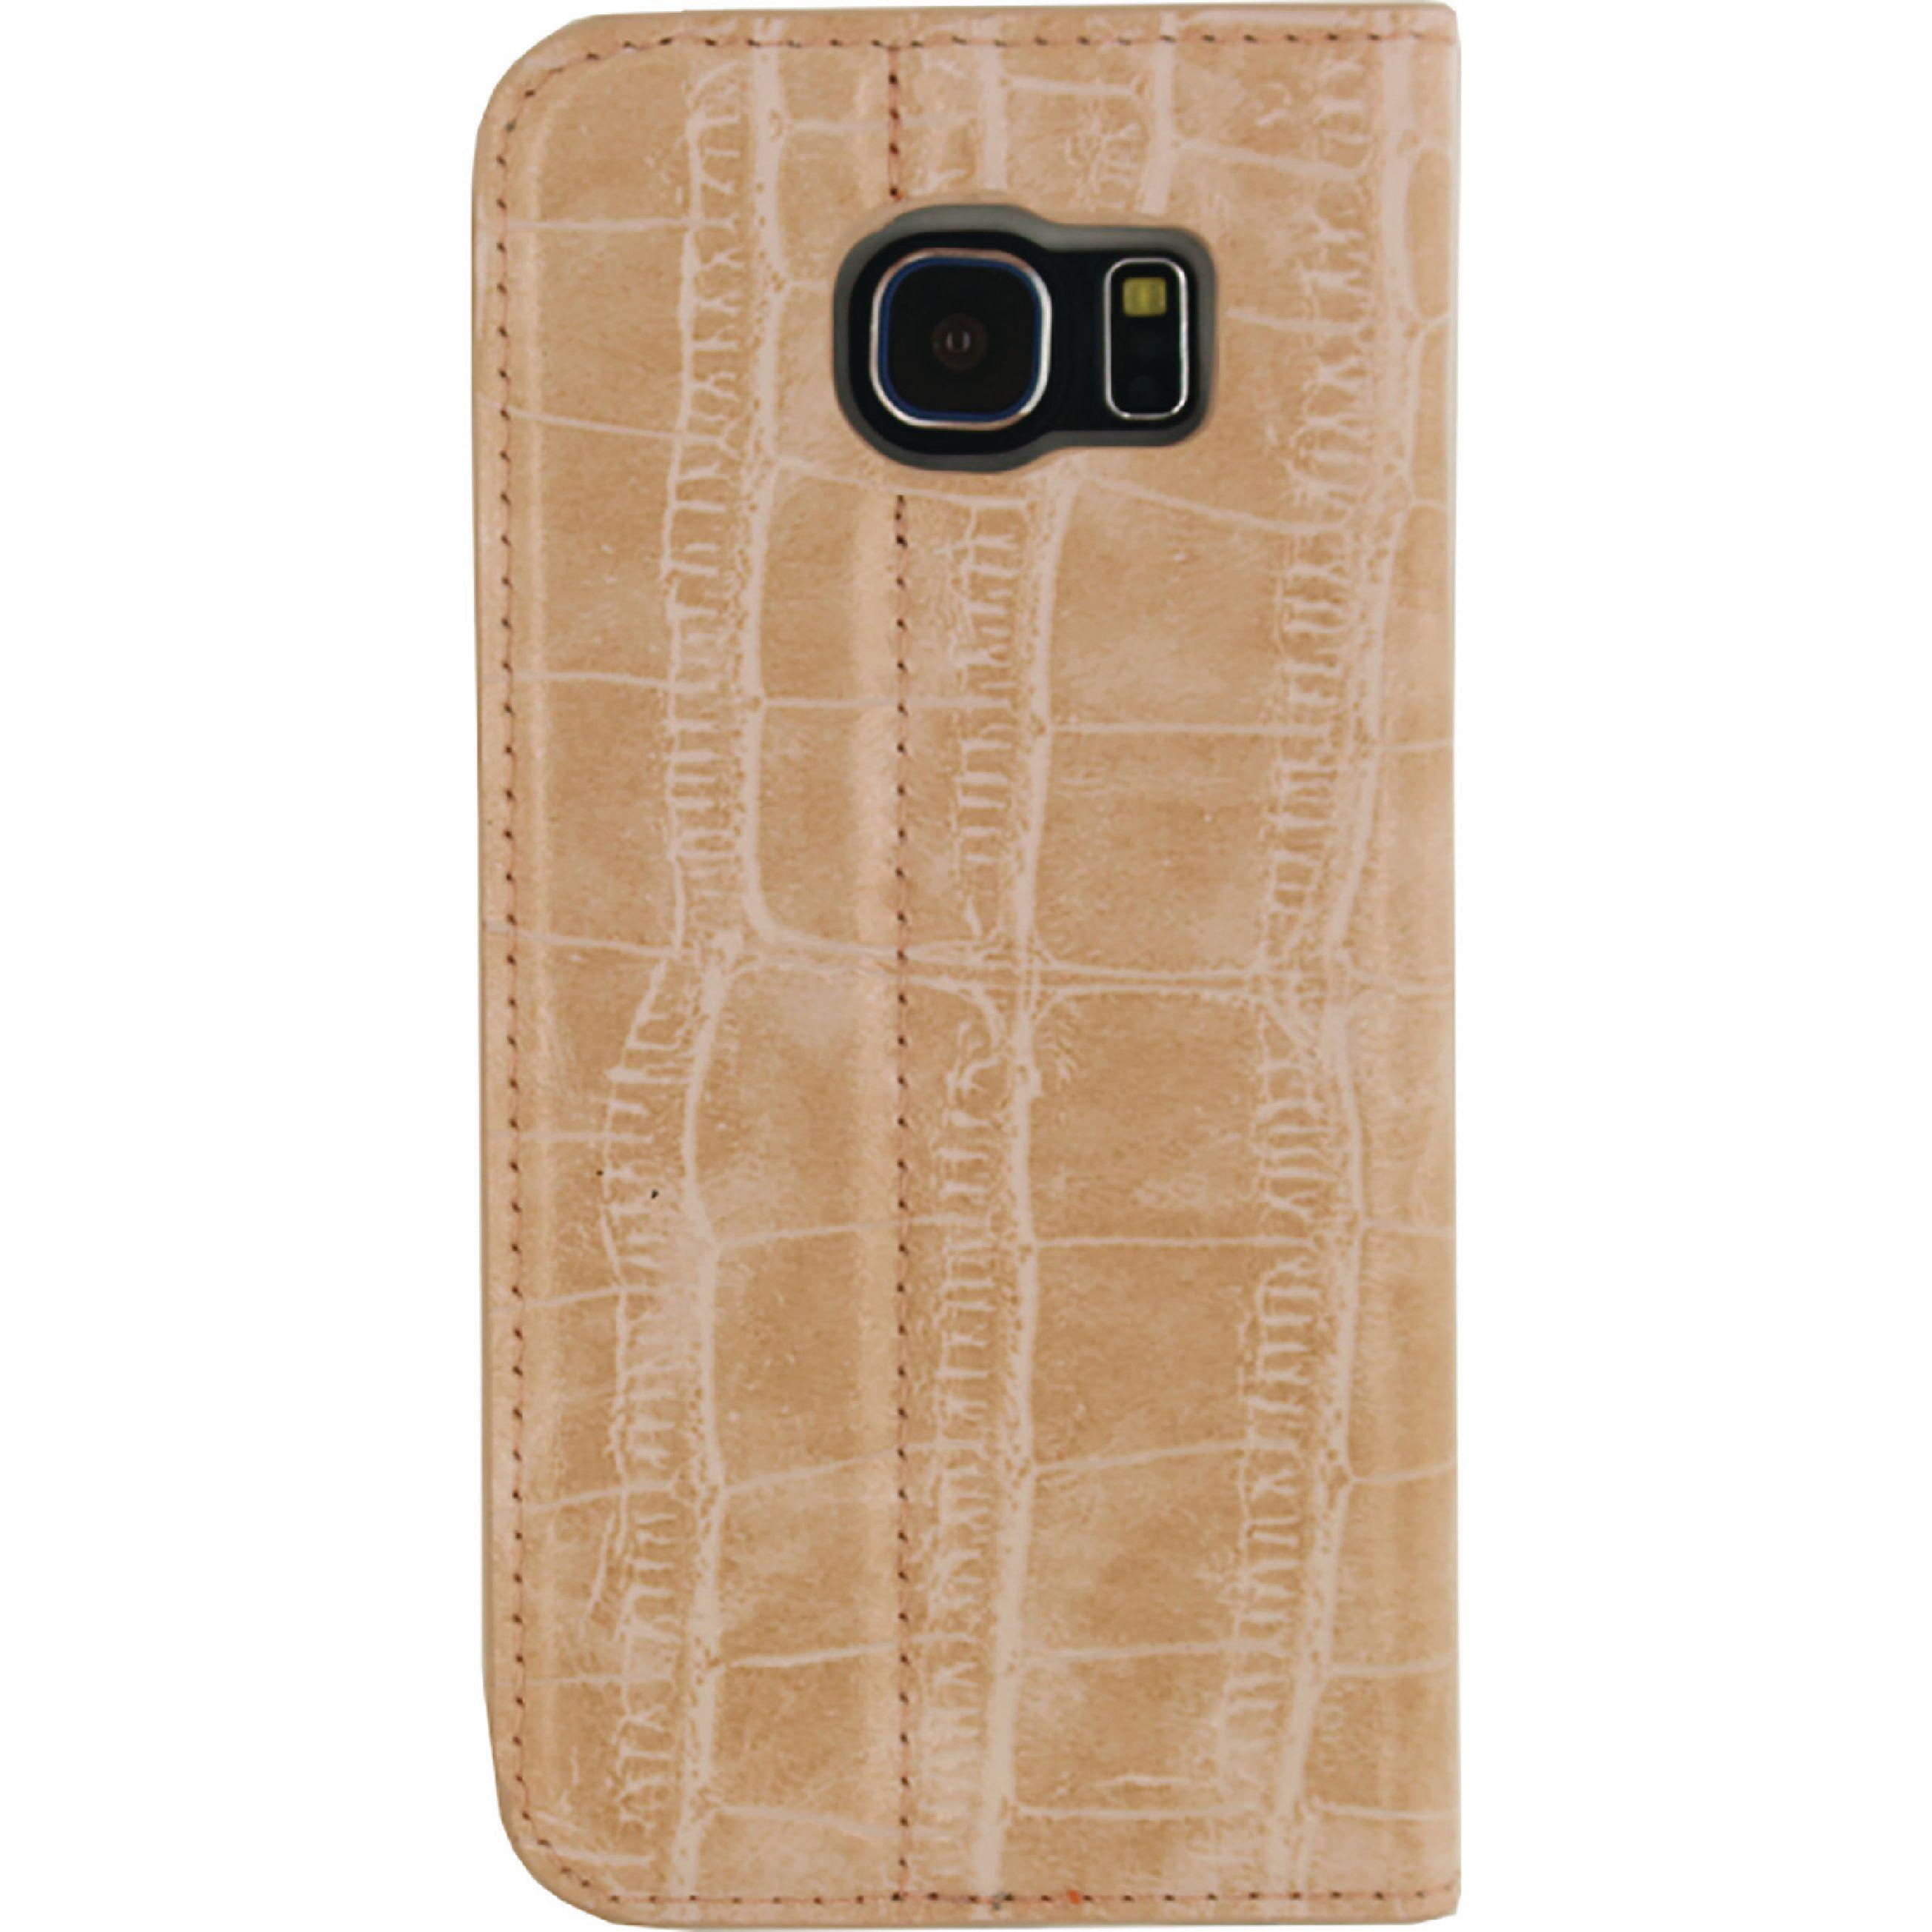 Image of   Telefon Gelly Lommebogsetui Samsung Galaxy S6 Pink